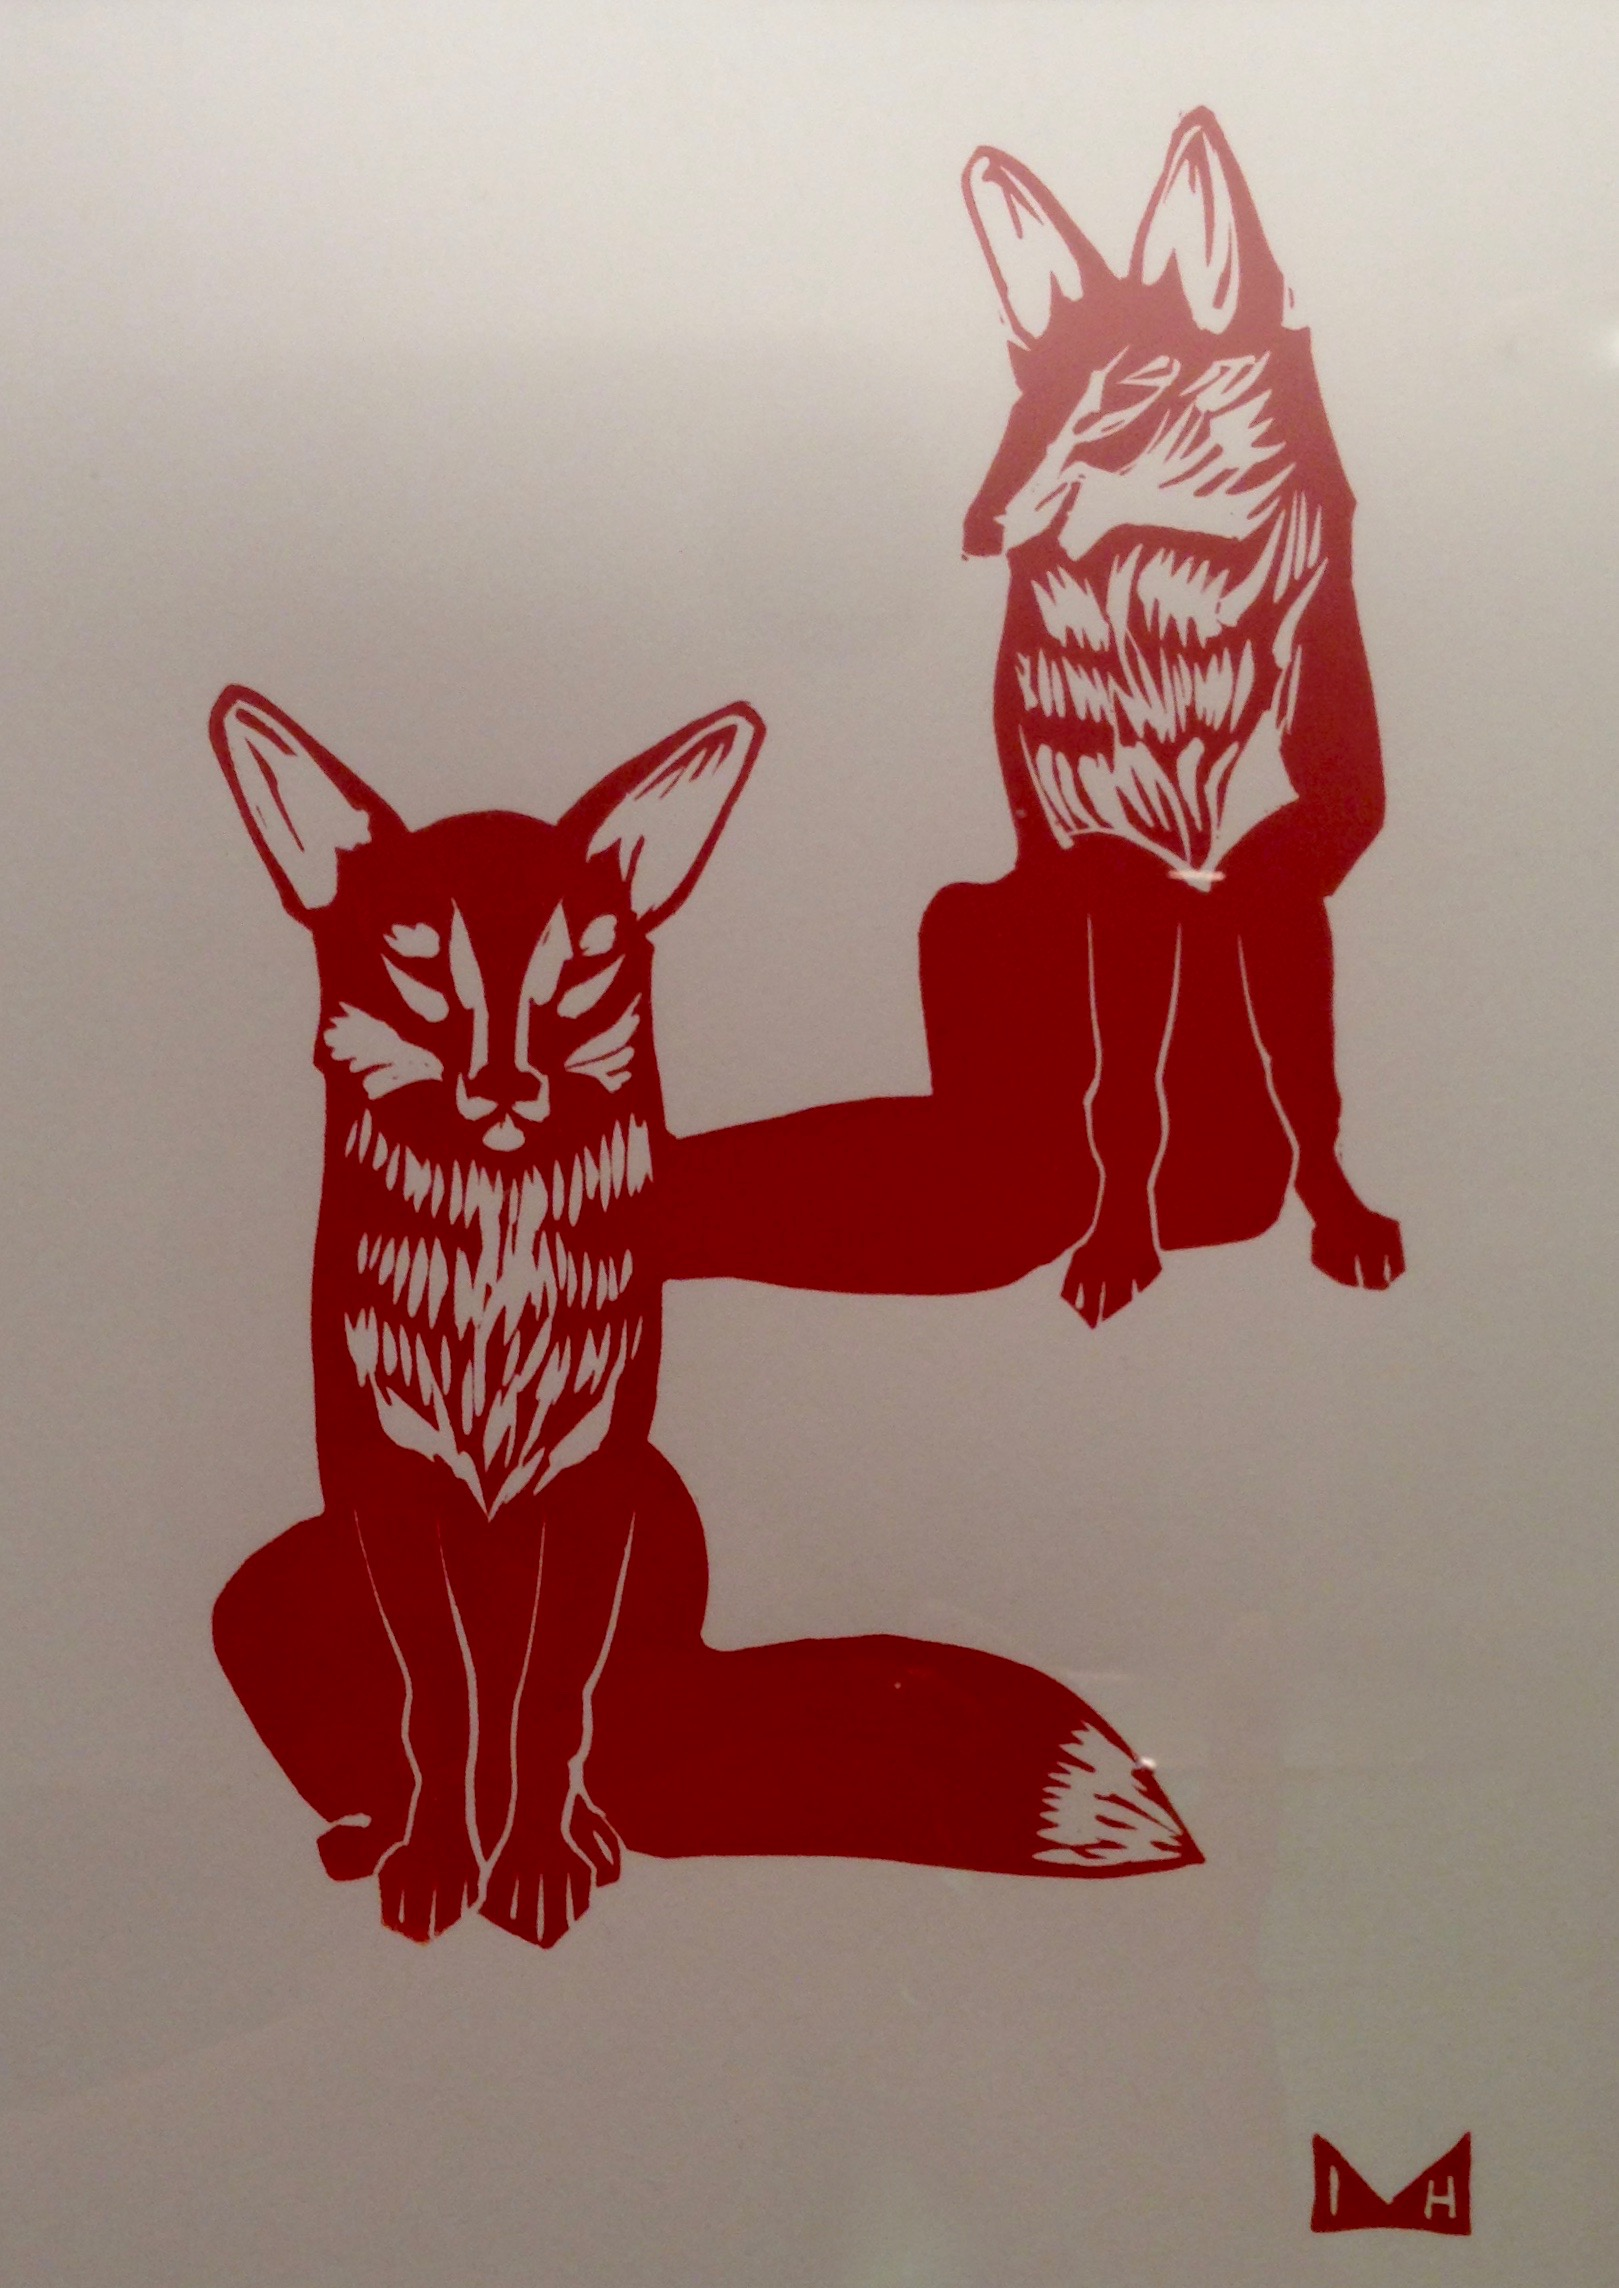 Illingworth Holey Kerr, Foxes